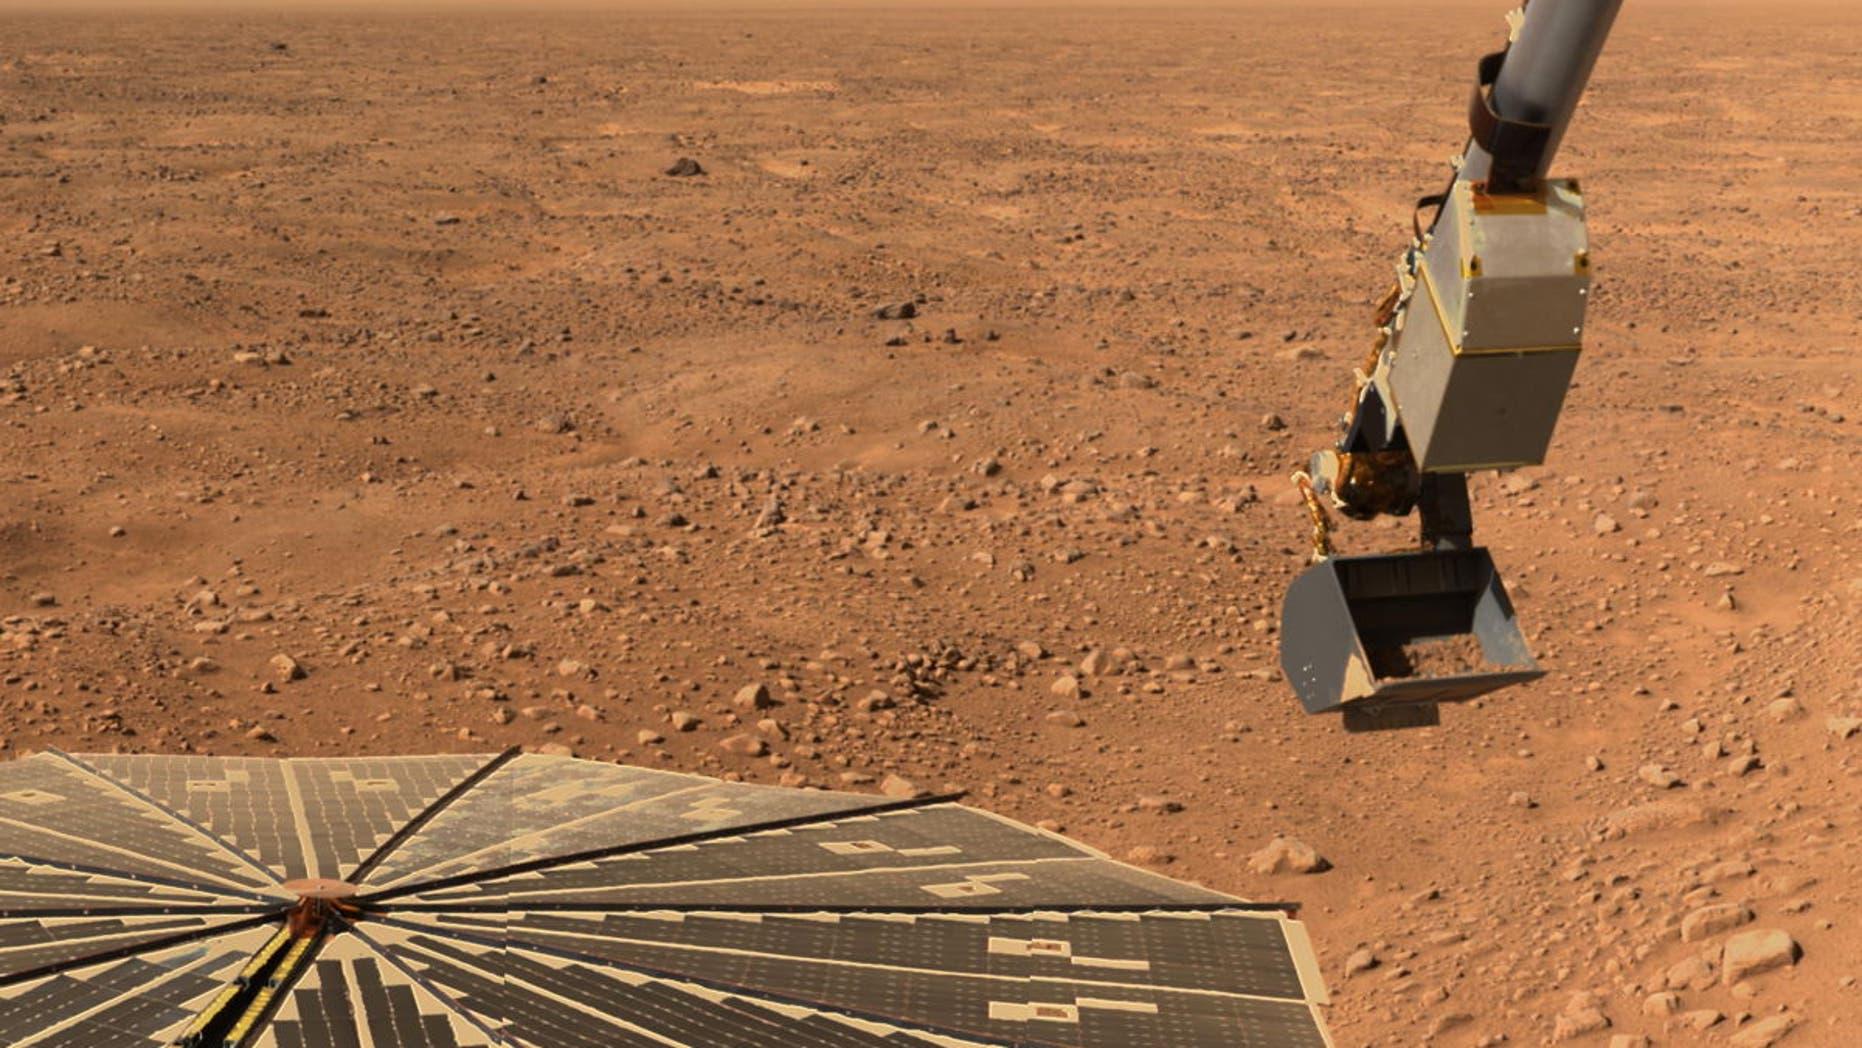 NASA's Phoenix Mars lander detected perchlorates in the Martian arctic's ice-rich soil in 2008.